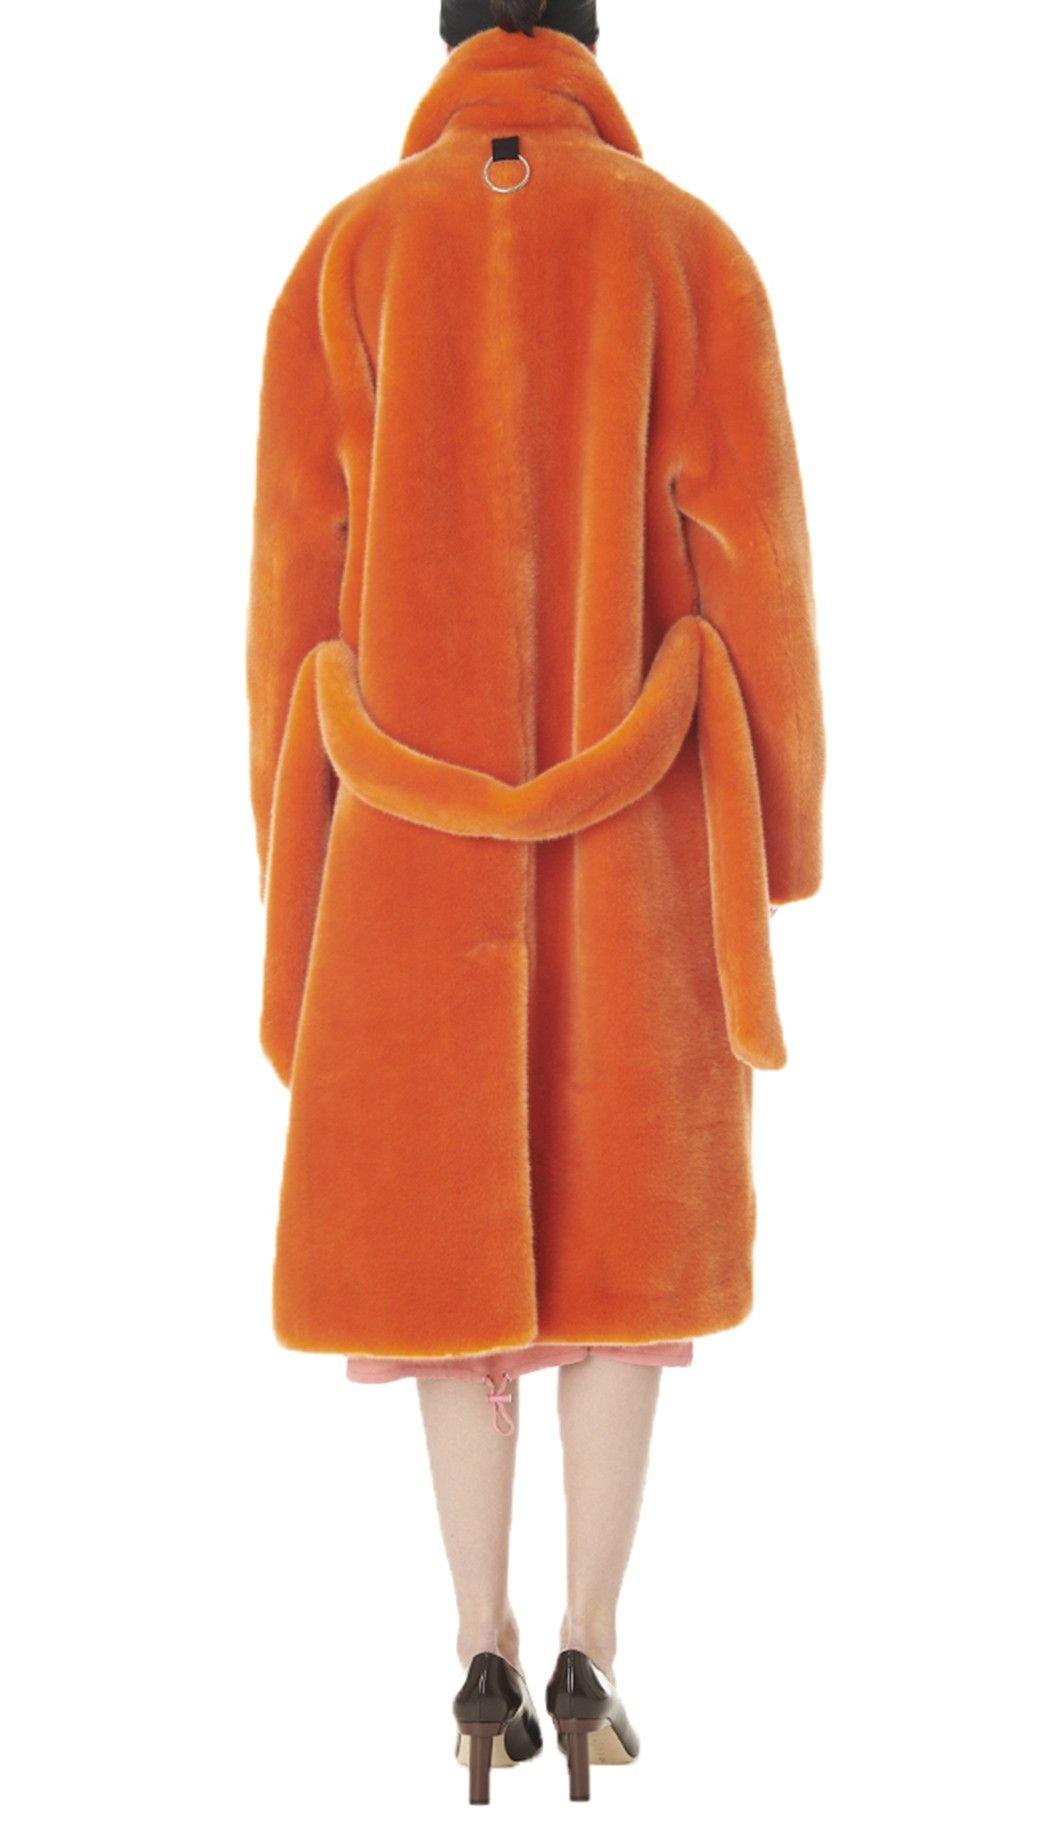 6e4013b5867b Tibi Luxe Faux Fur Oversized Coat - Orange Xxs Yellow